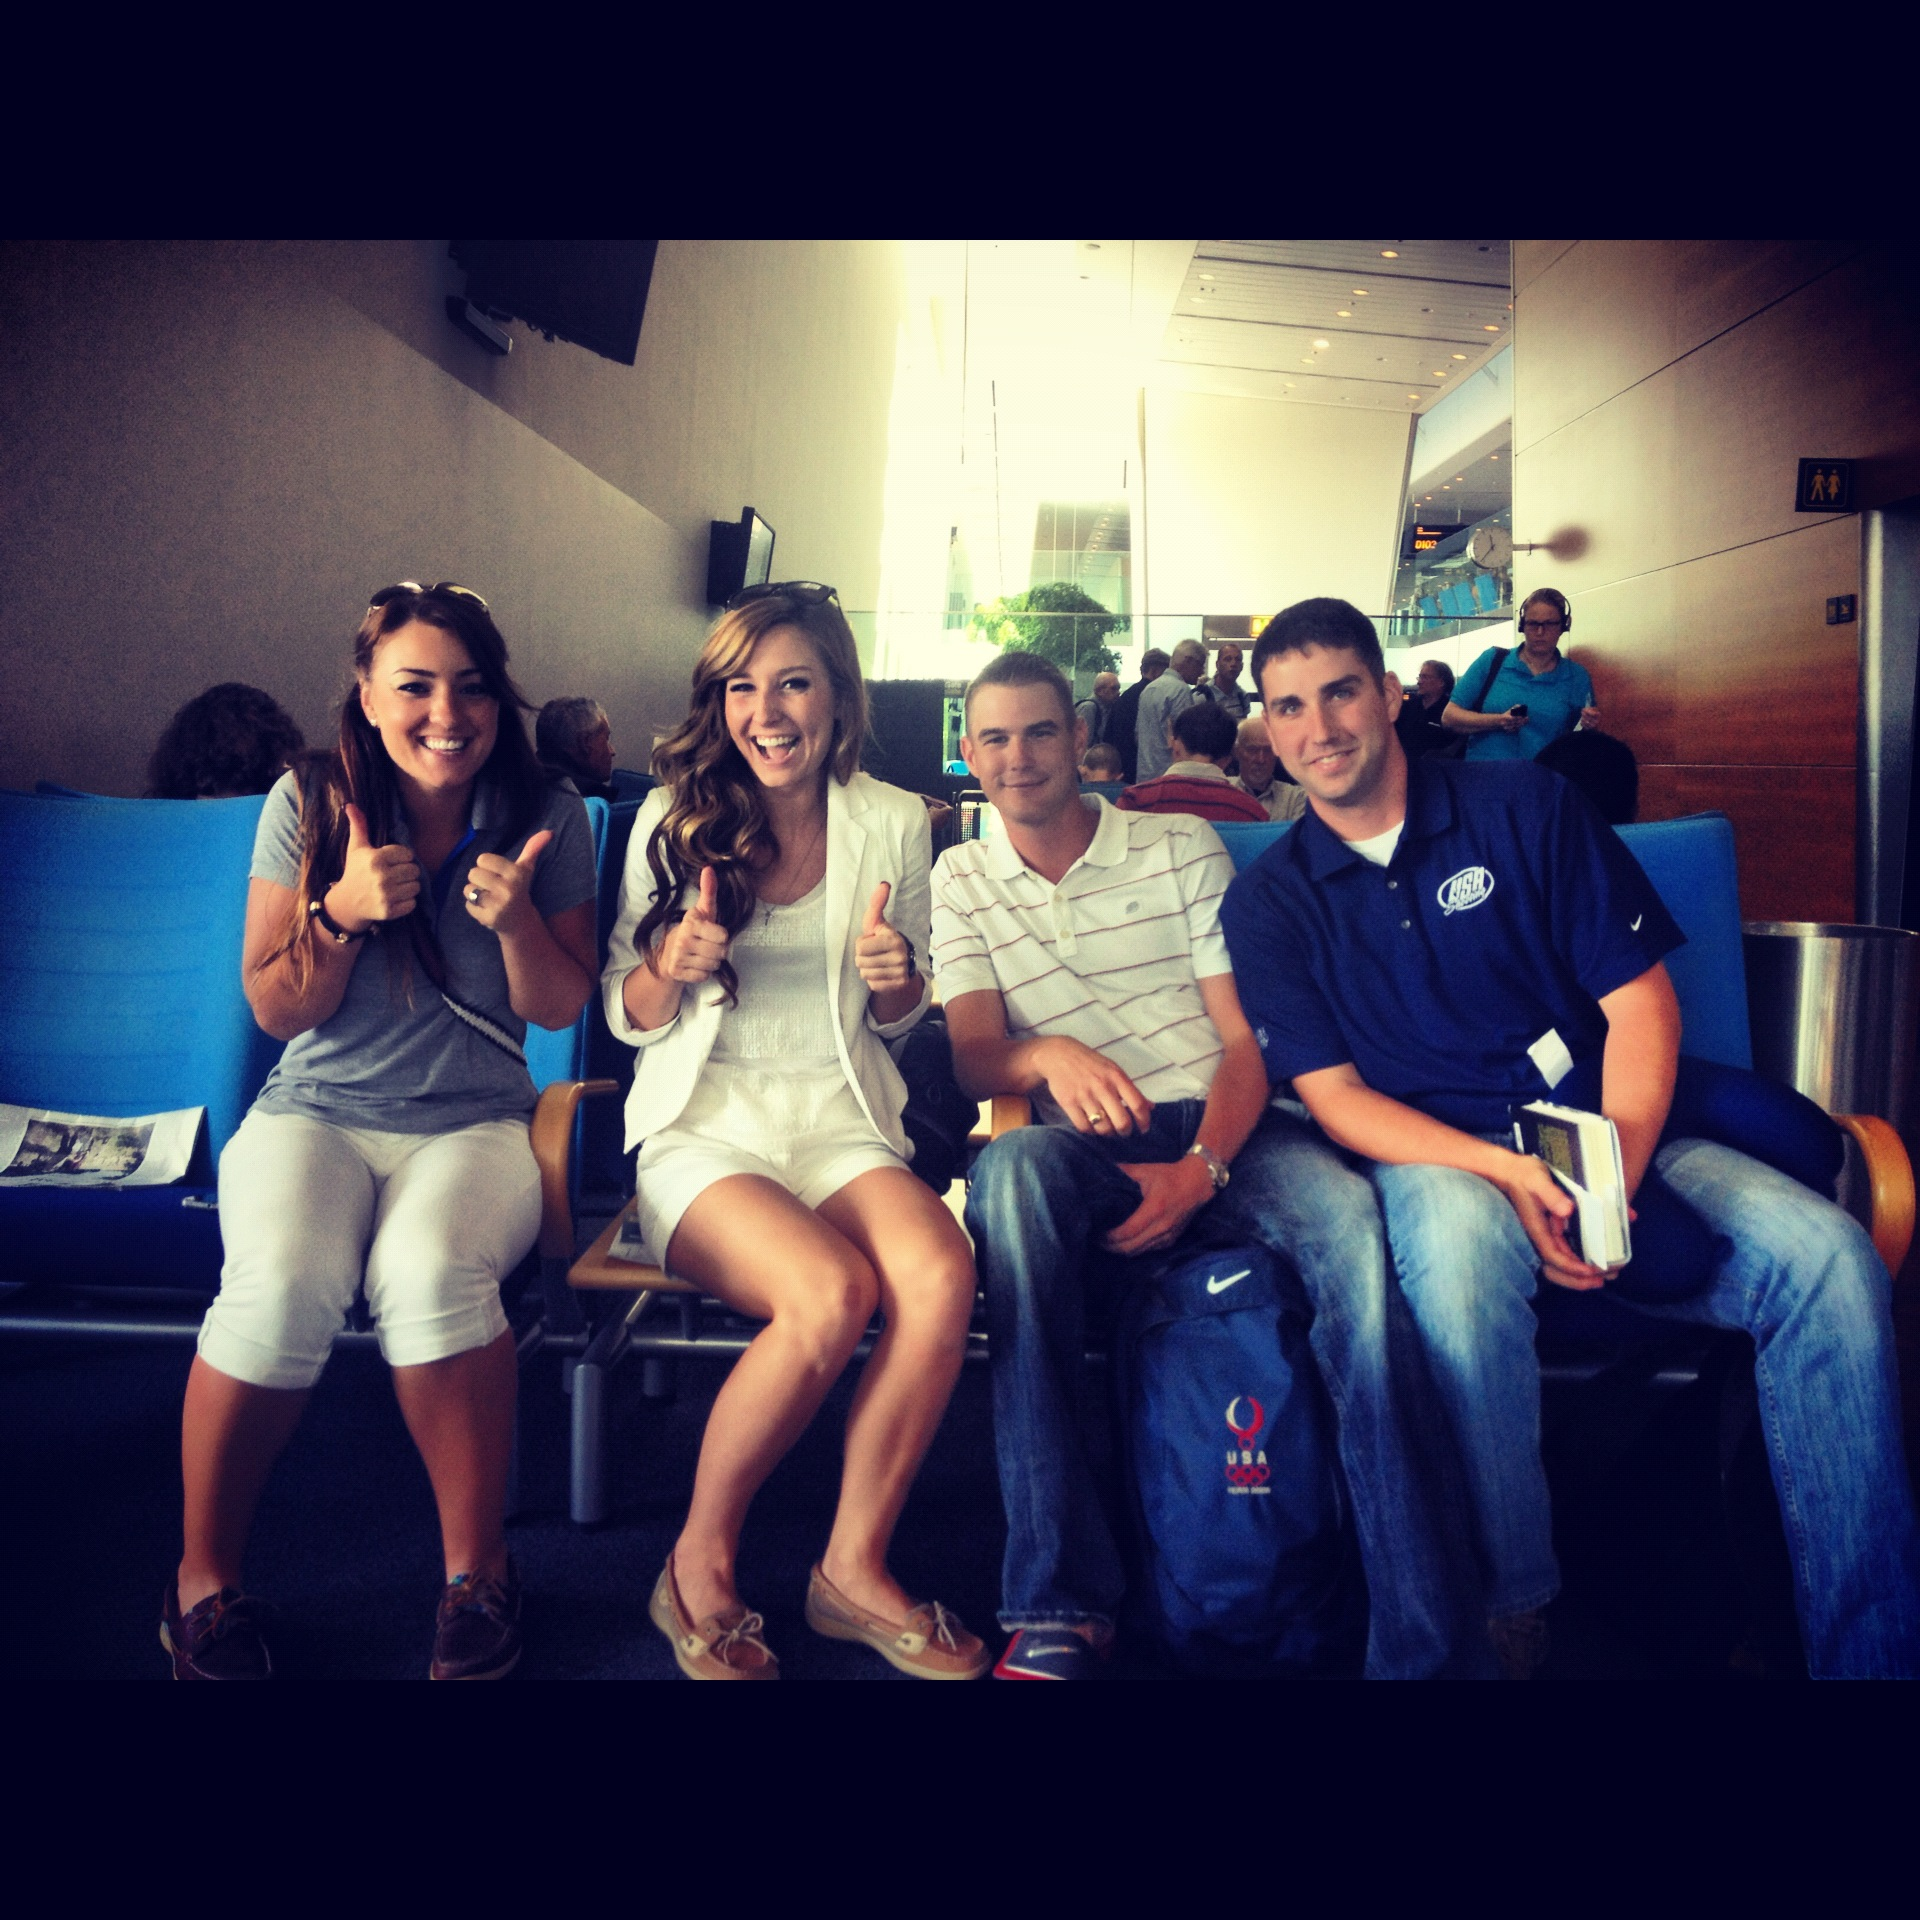 2012-07-29-airport.JPG